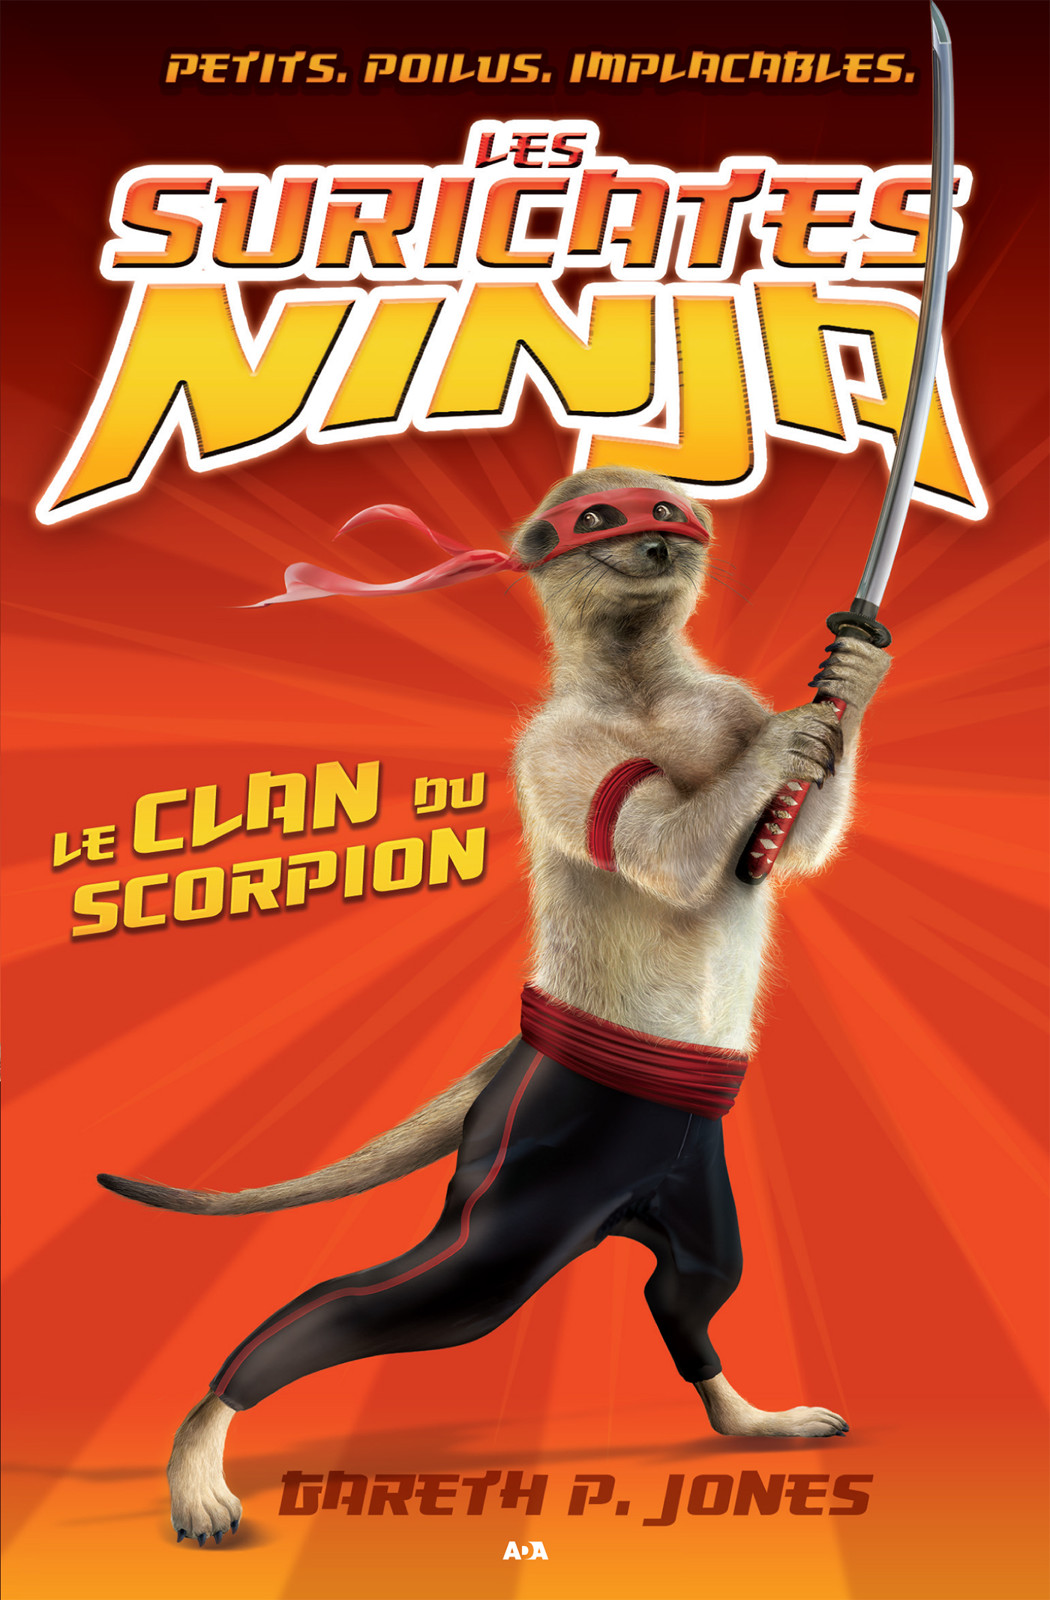 Les suricates ninja, Le clan du scorpion